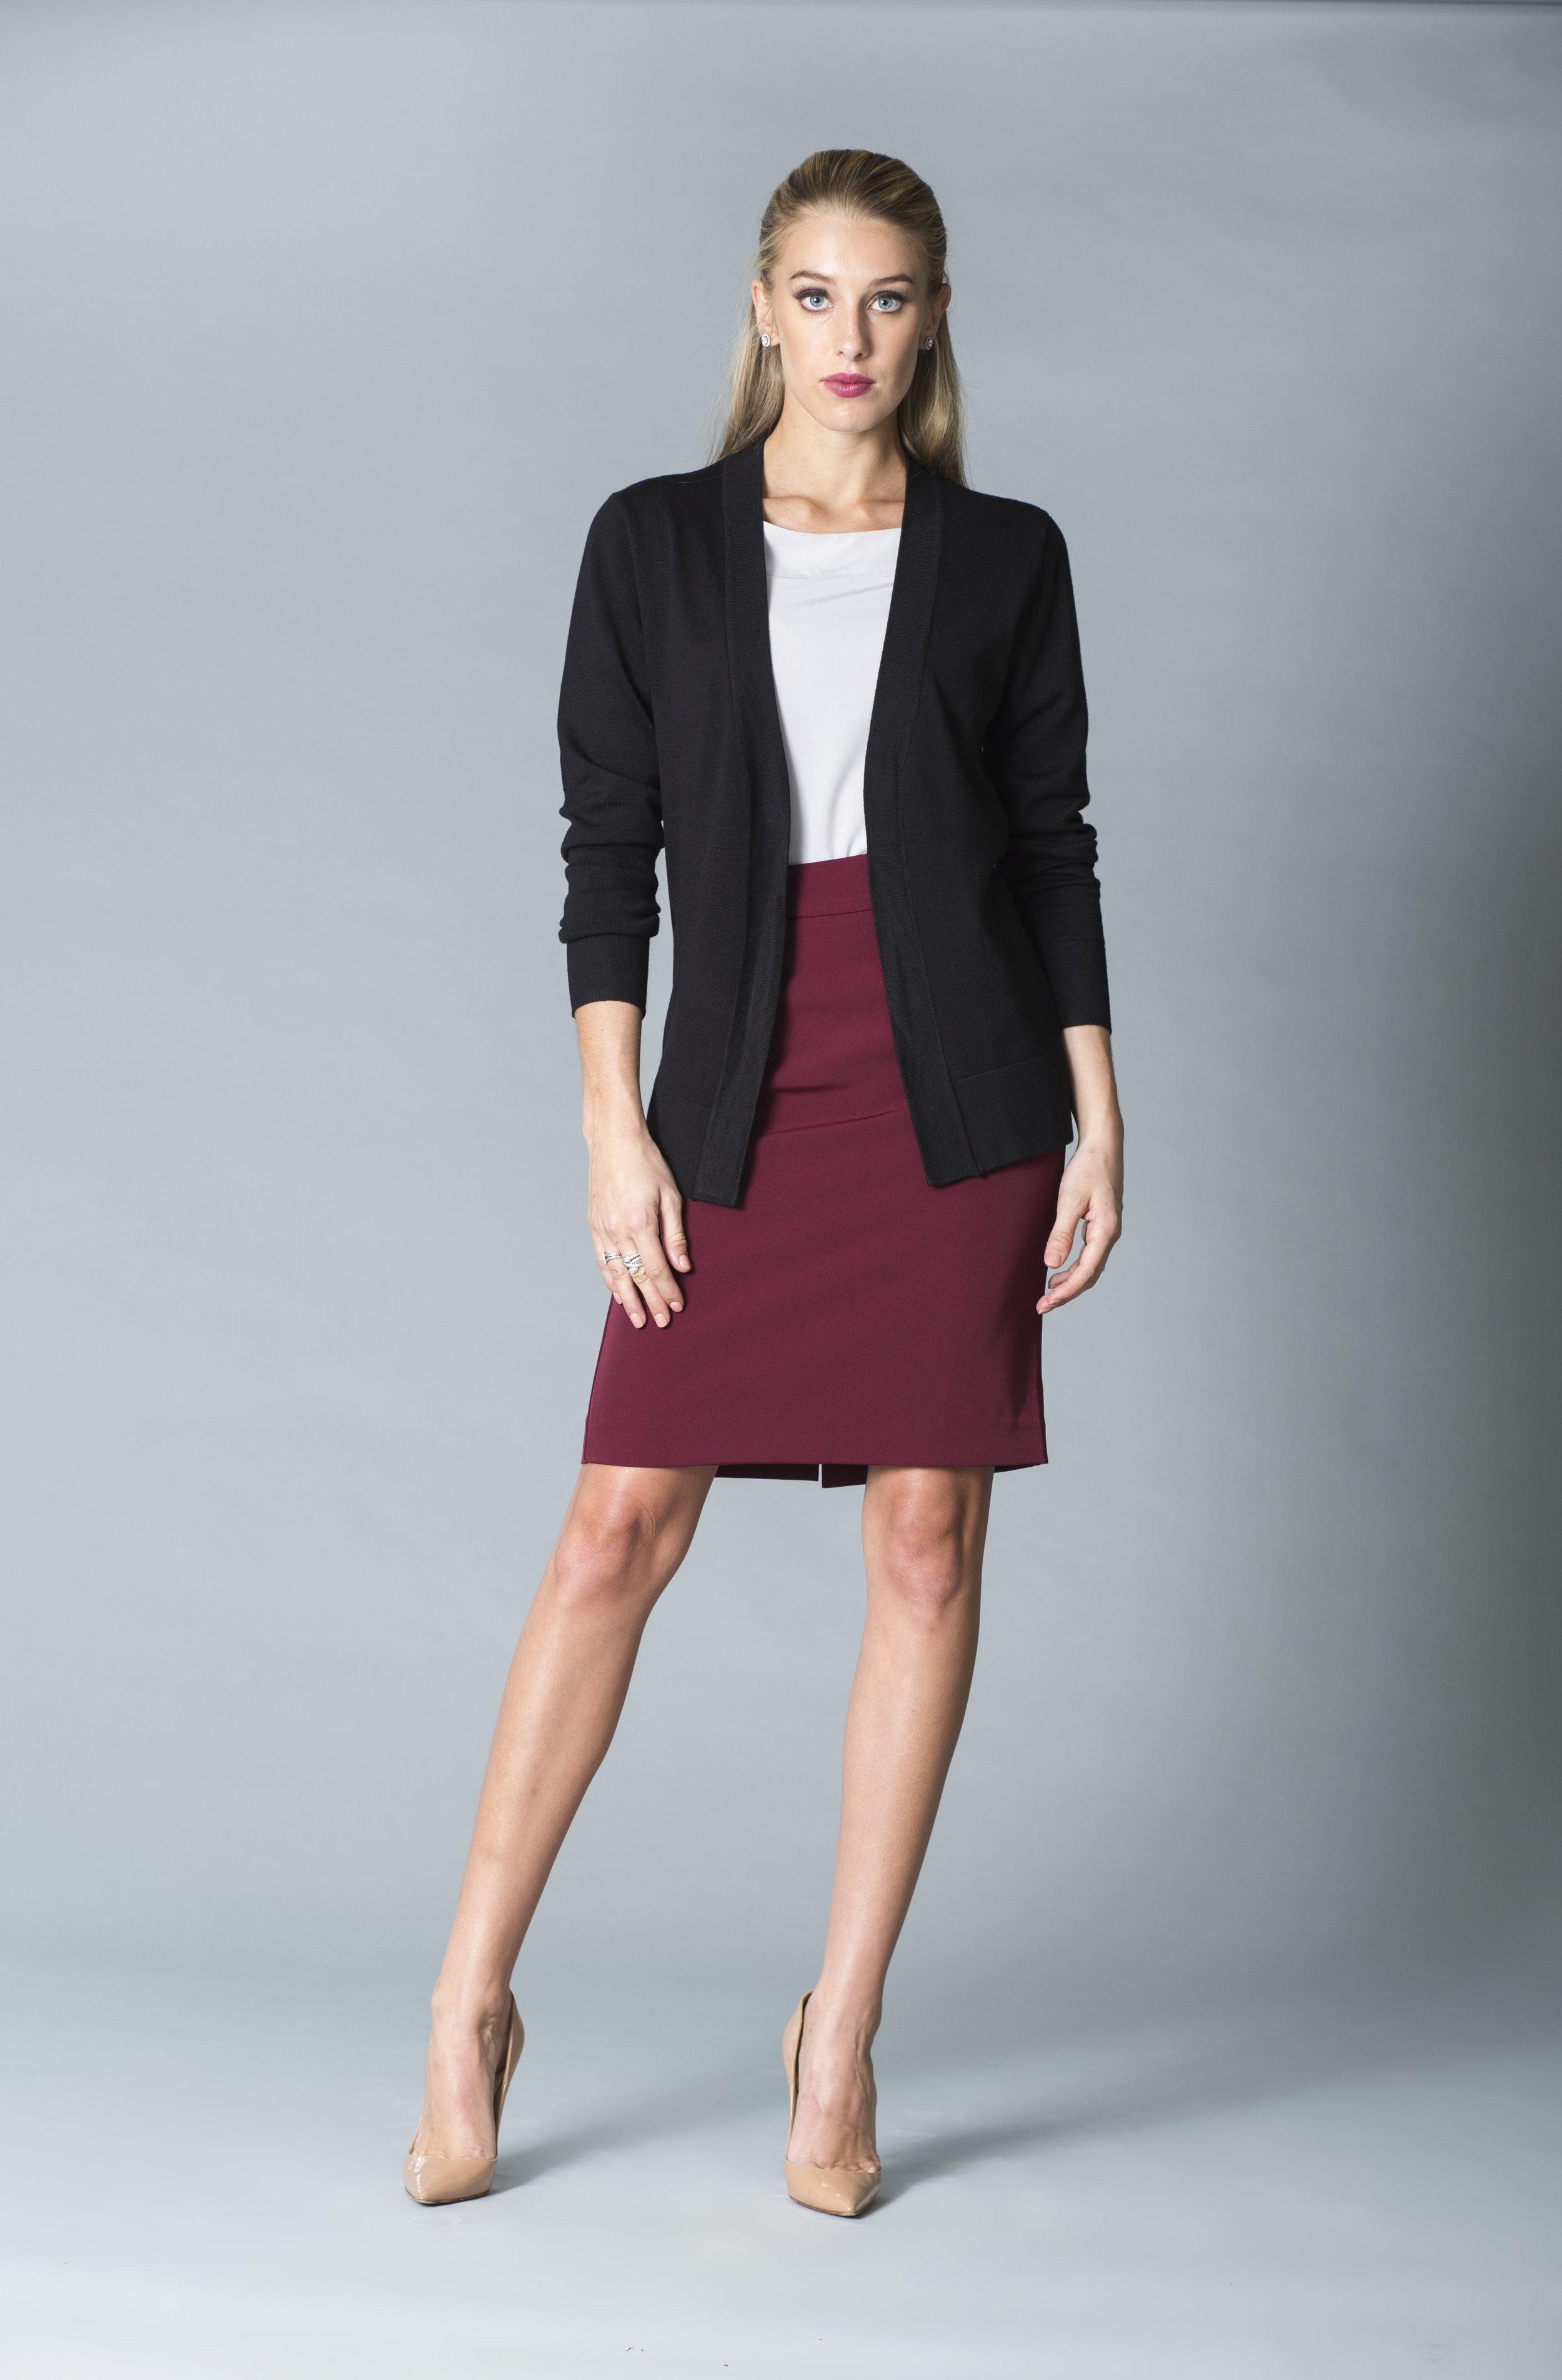 MDSN 624 gris - falda vino-cardigan negro copy.jpg